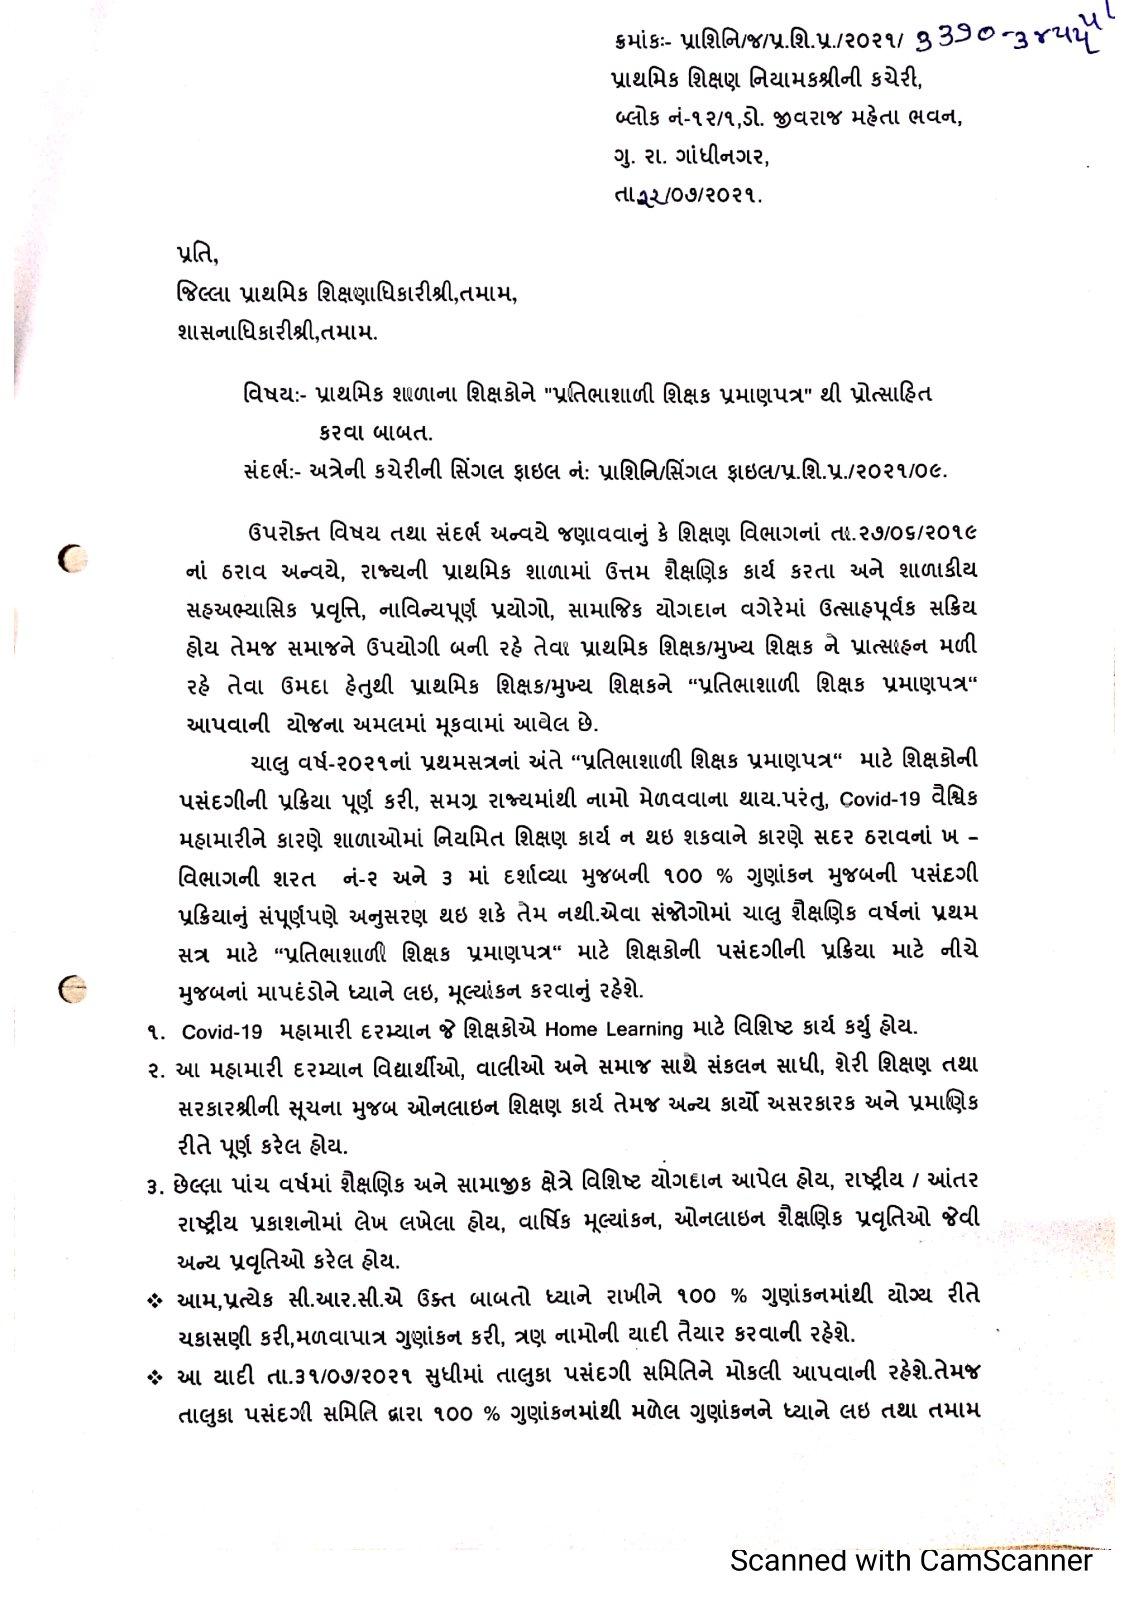 https://project303.blogspot.com/2021/07/pratibhashali-shixak-paripatra.html